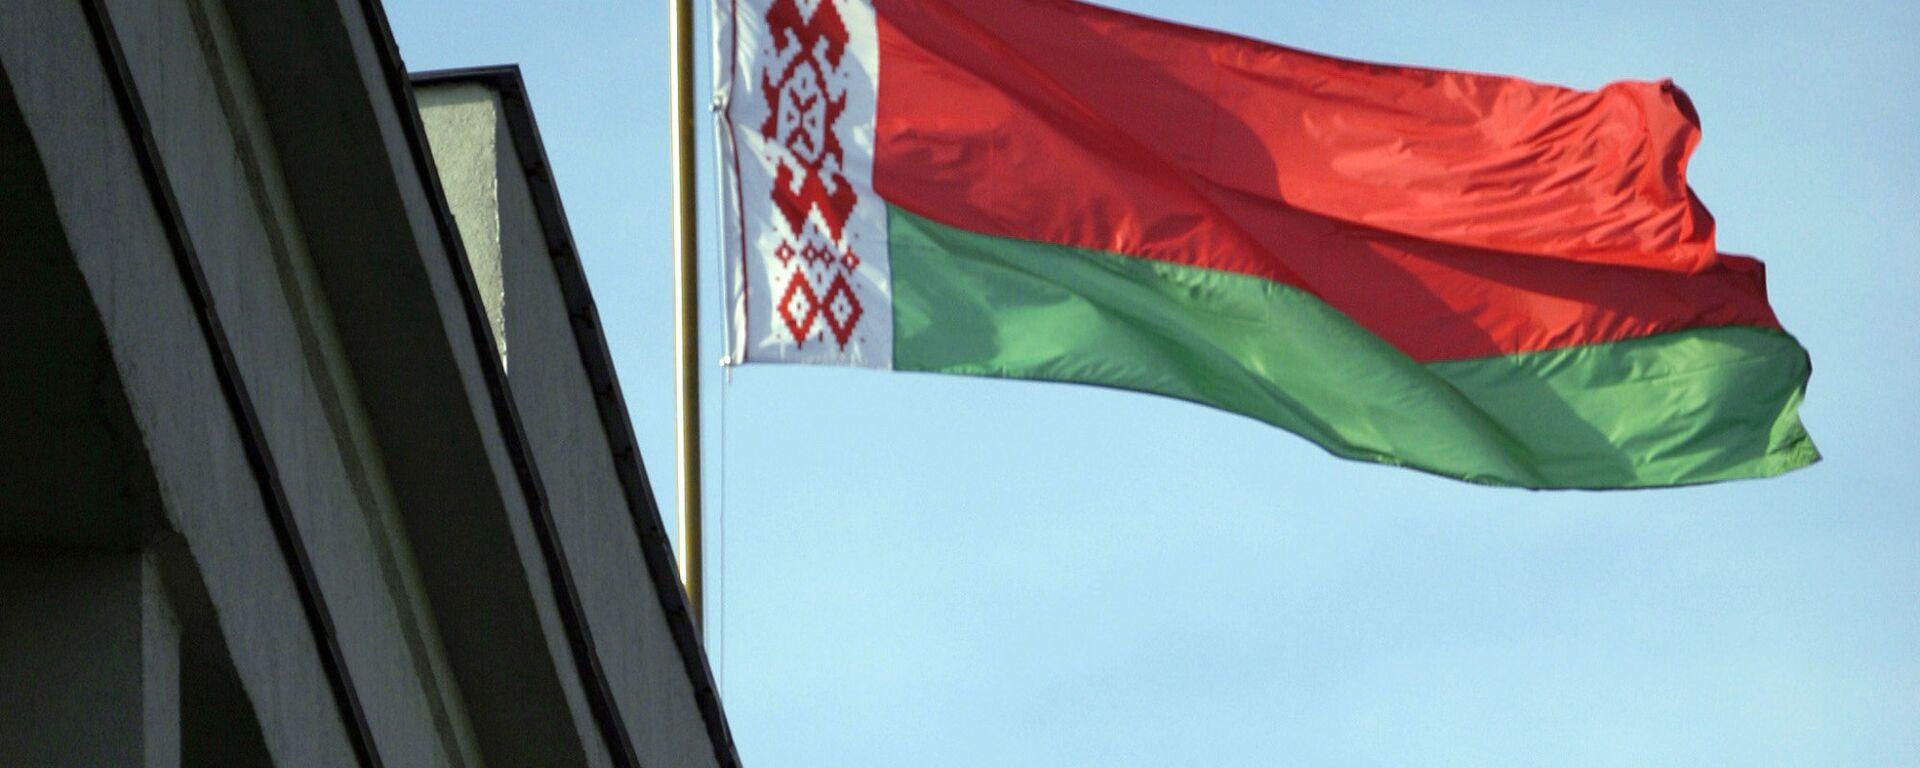 Bandera de Bielorrusia - Sputnik Mundo, 1920, 21.12.2020